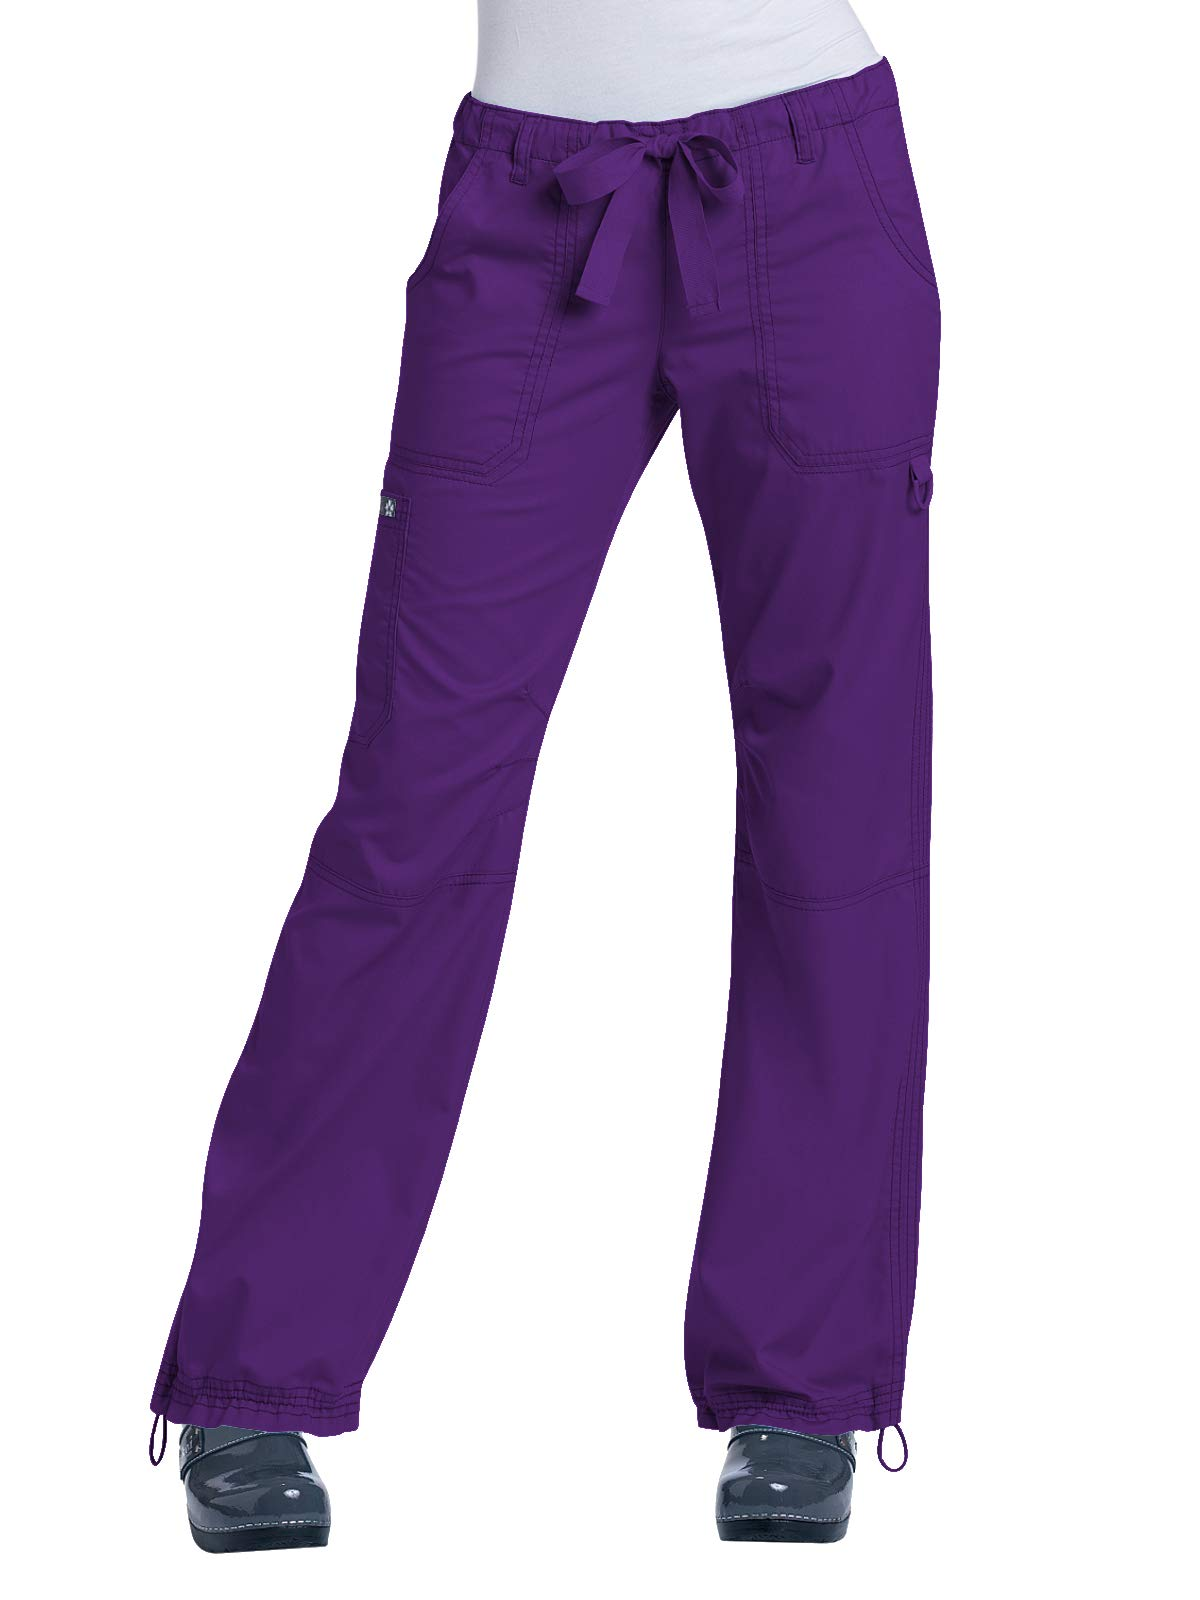 KOI Classics 701 Women's Lindsey Scrub Pant Grape 2XL